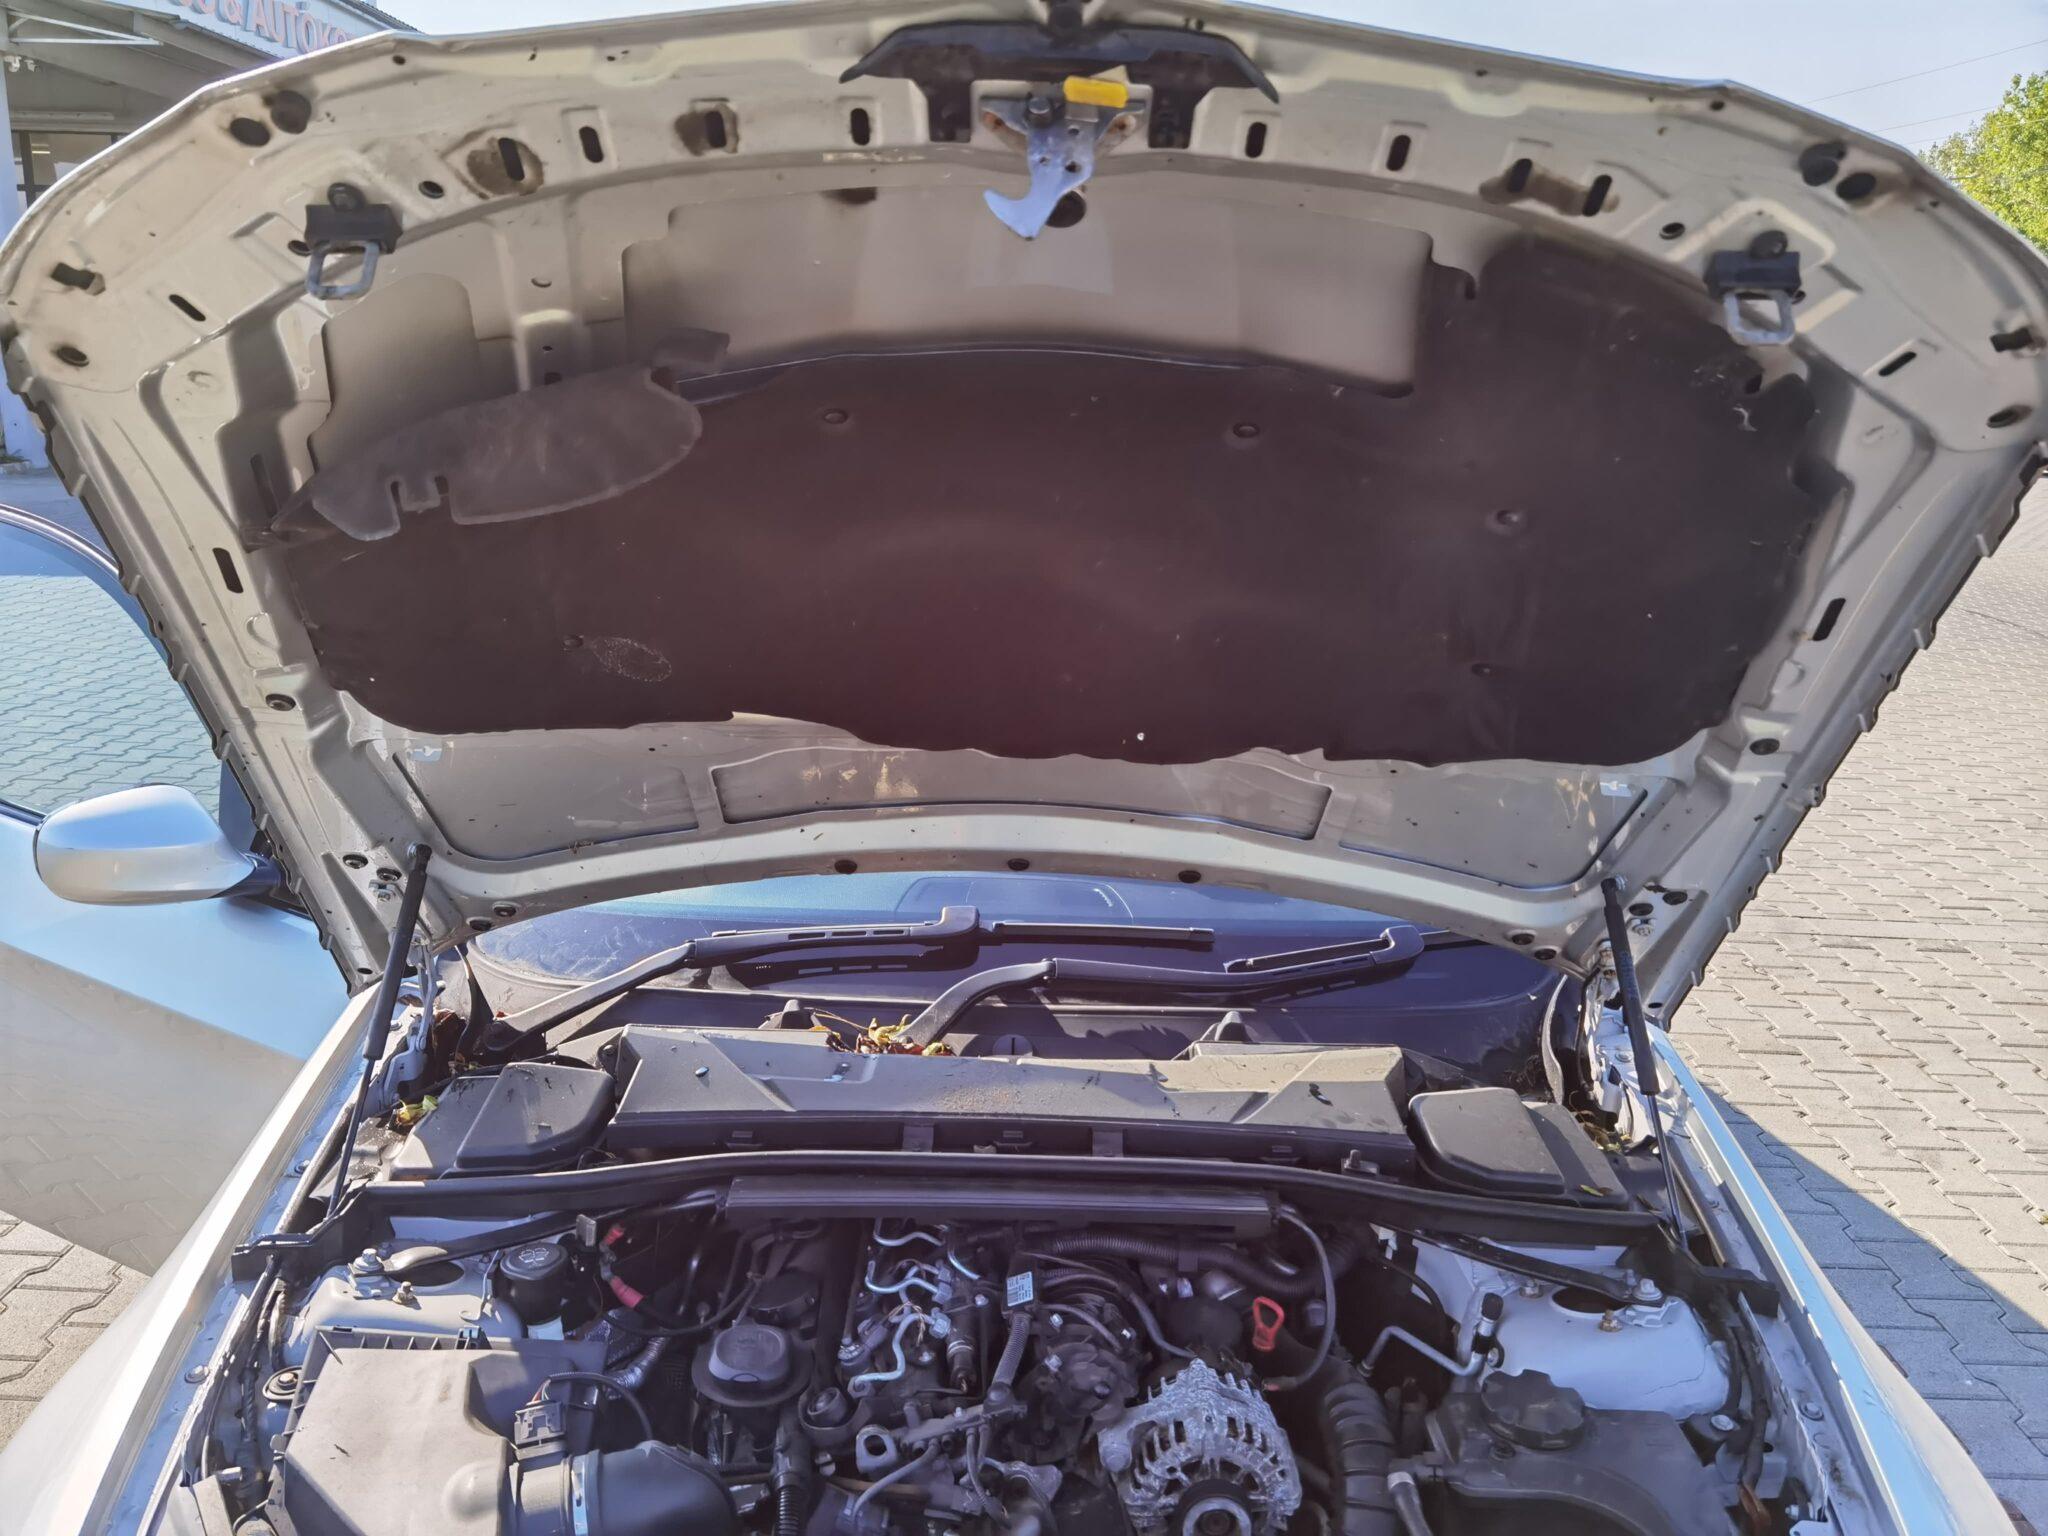 BMW E90 lci 318d Carbon Car Center Békéscsaba-16